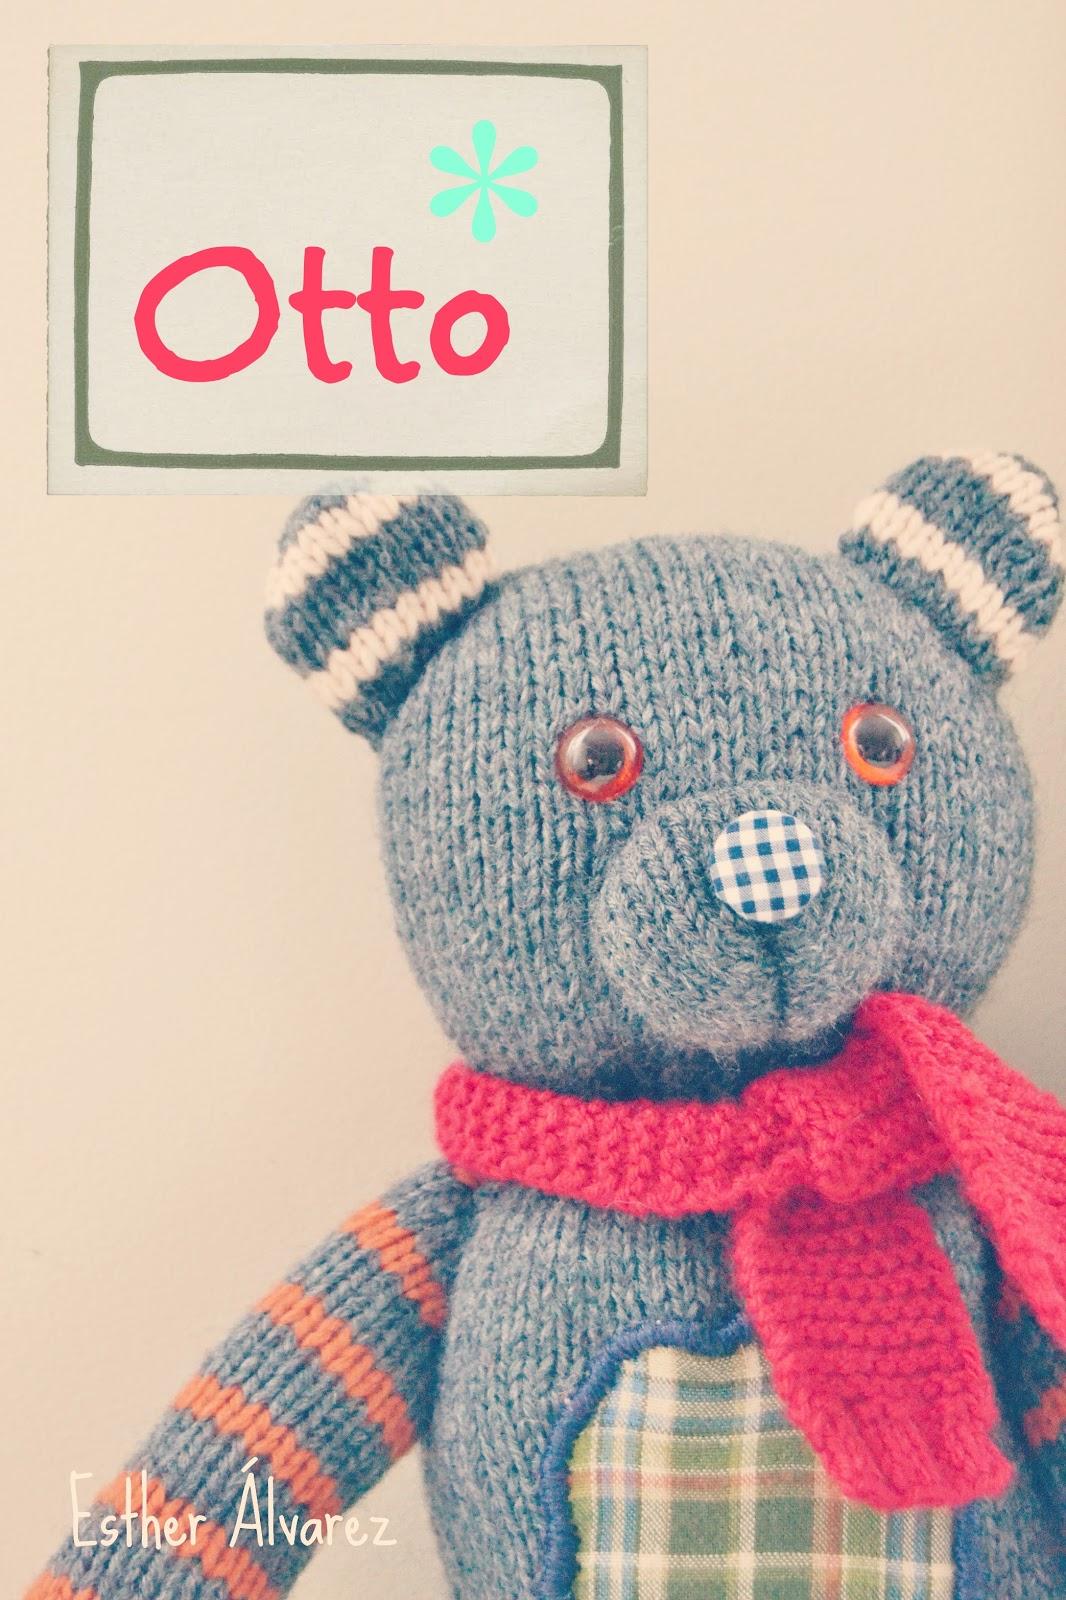 estherálvarezzzz: Otto: un osito paso a paso.